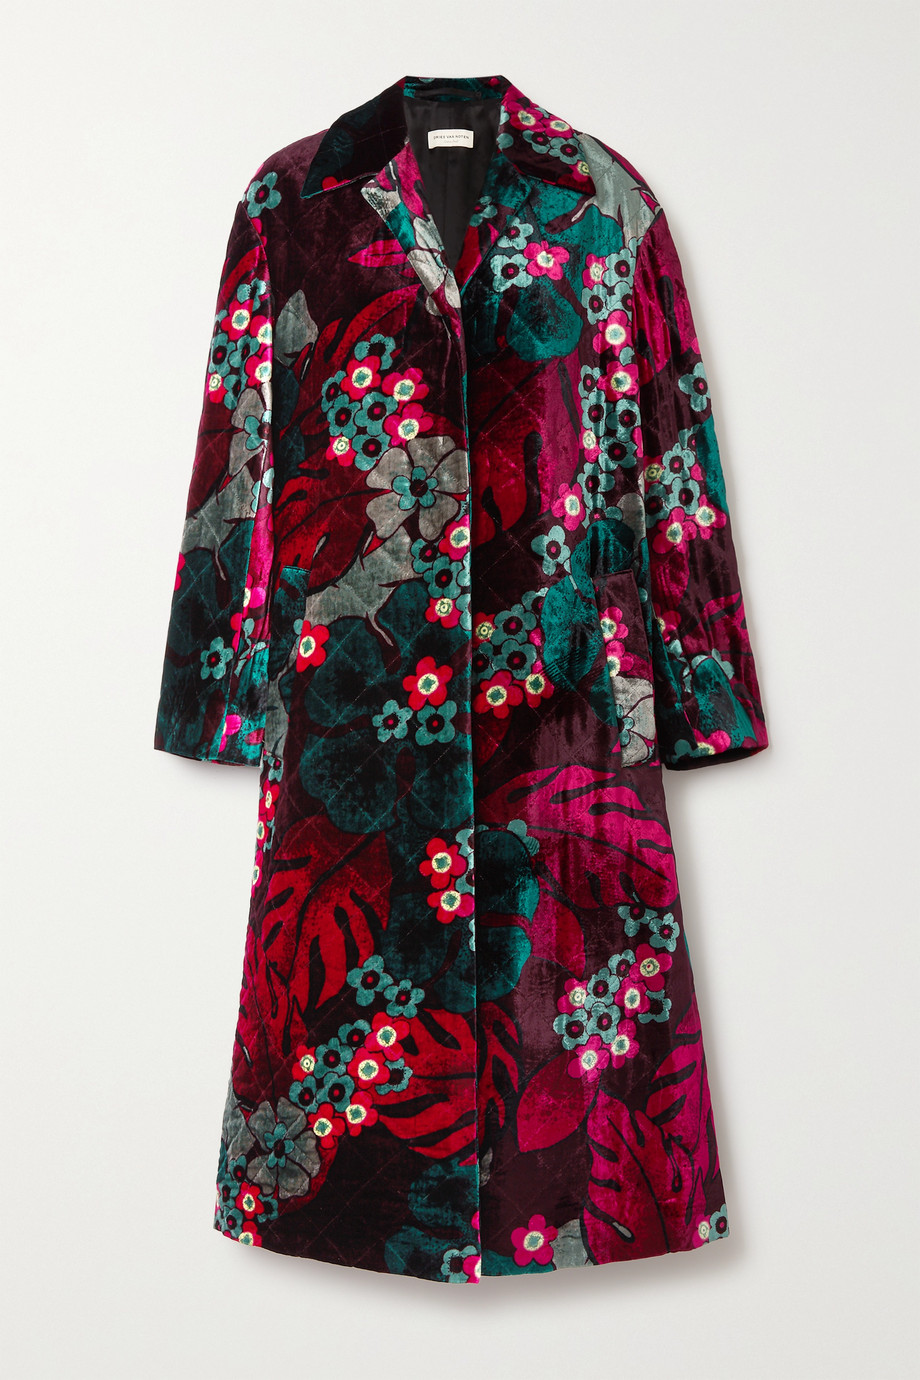 Dries Van Noten Mantel aus gestepptem Samt mit Blumenprint